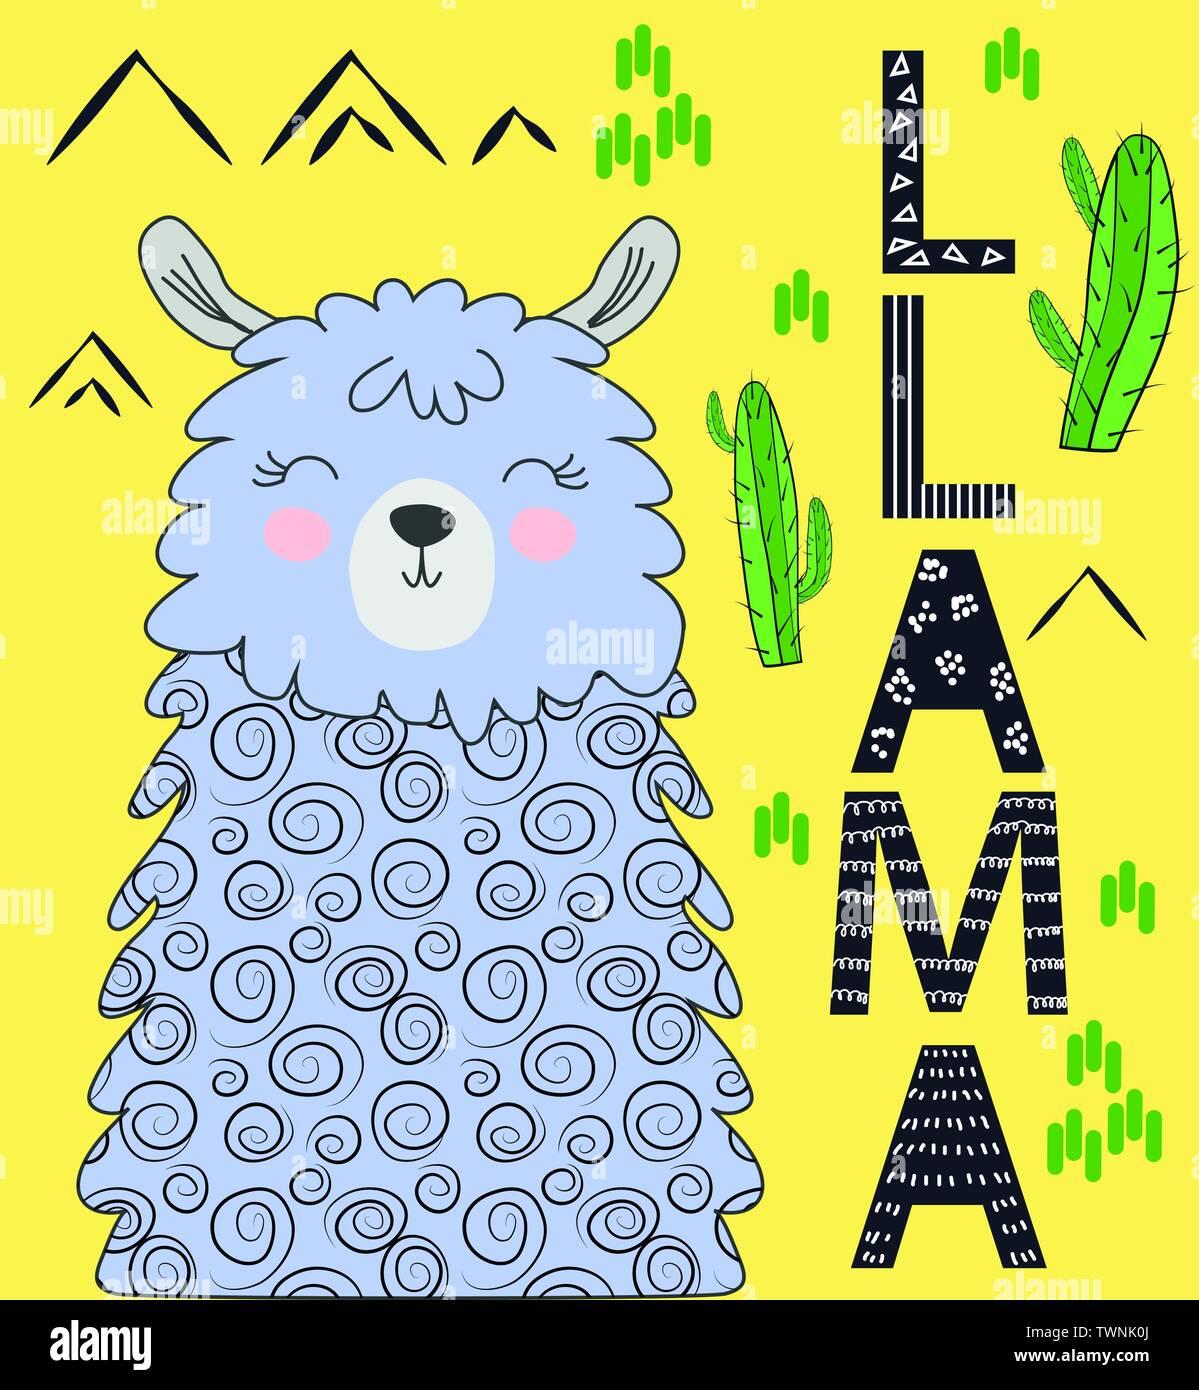 Cute cartoon llama alpaca vector graphic design set. Hand drawn llama character illustration and cactus elements - Stock Vector